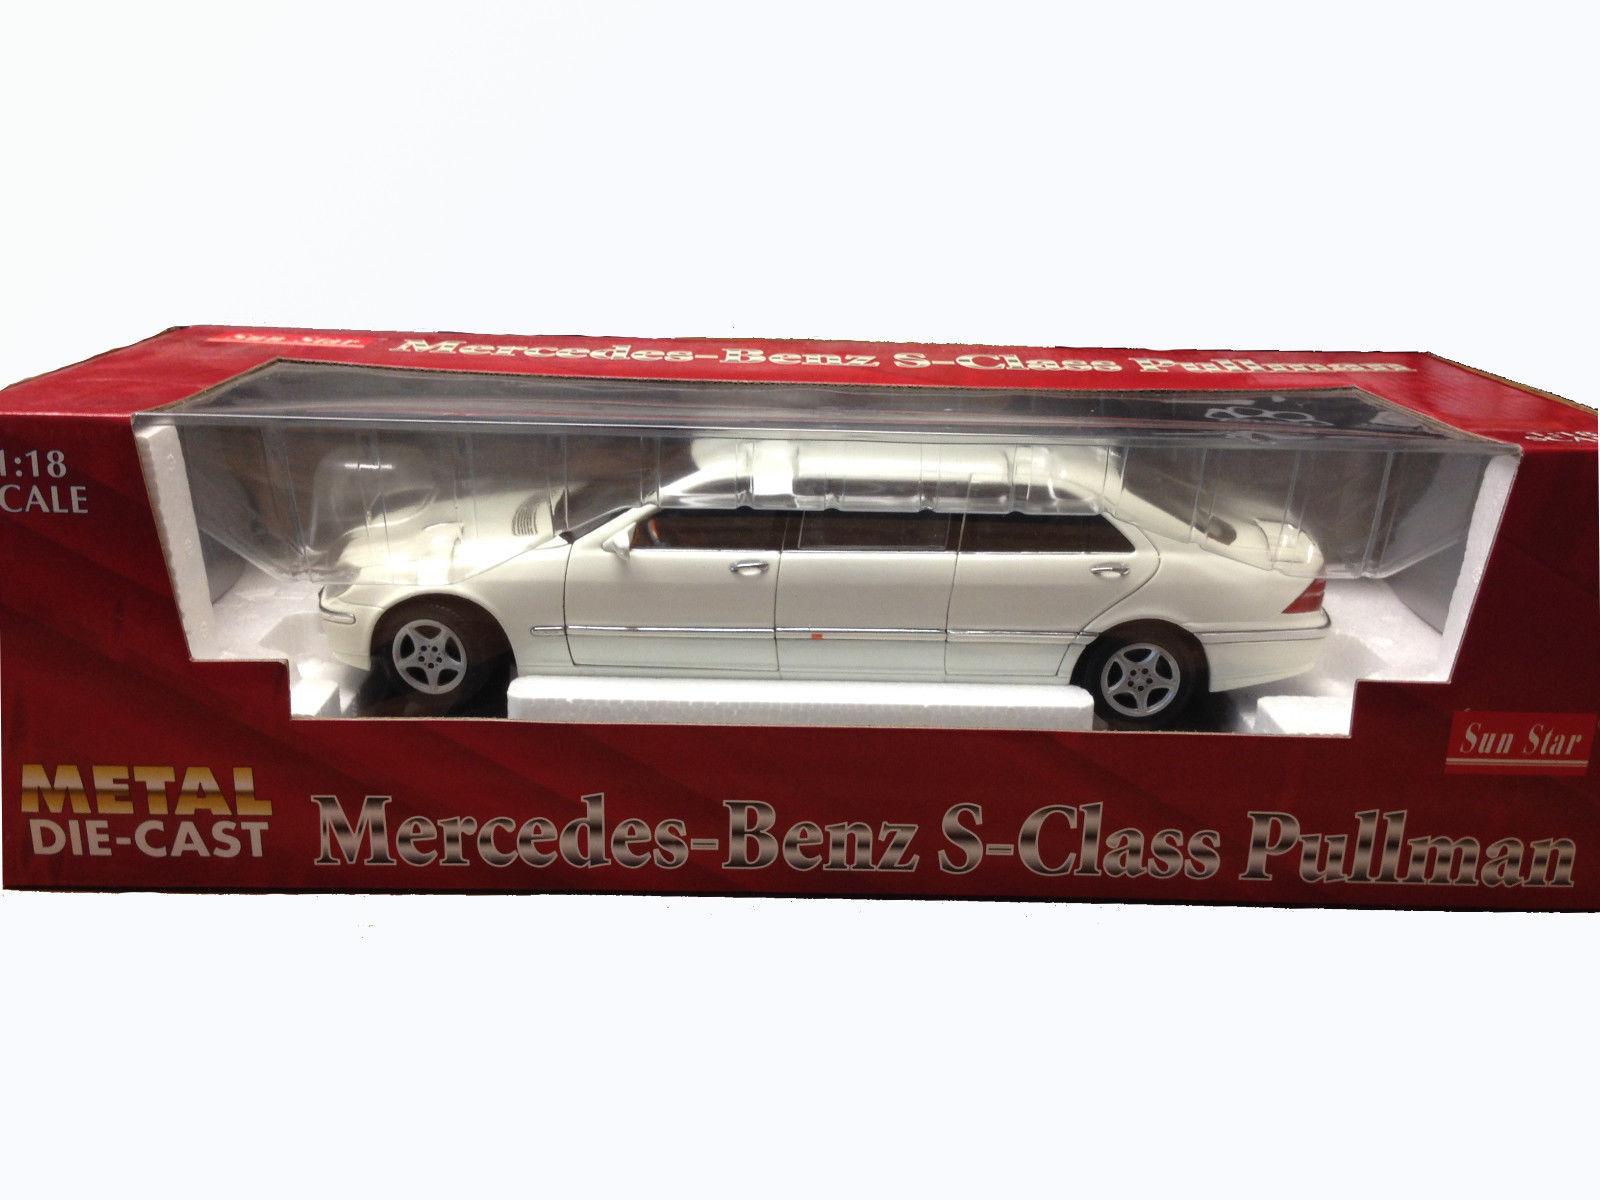 Sun Star white Mercedes-Benz S-Class Pullman DIECAST SCALE 1:18 #2203